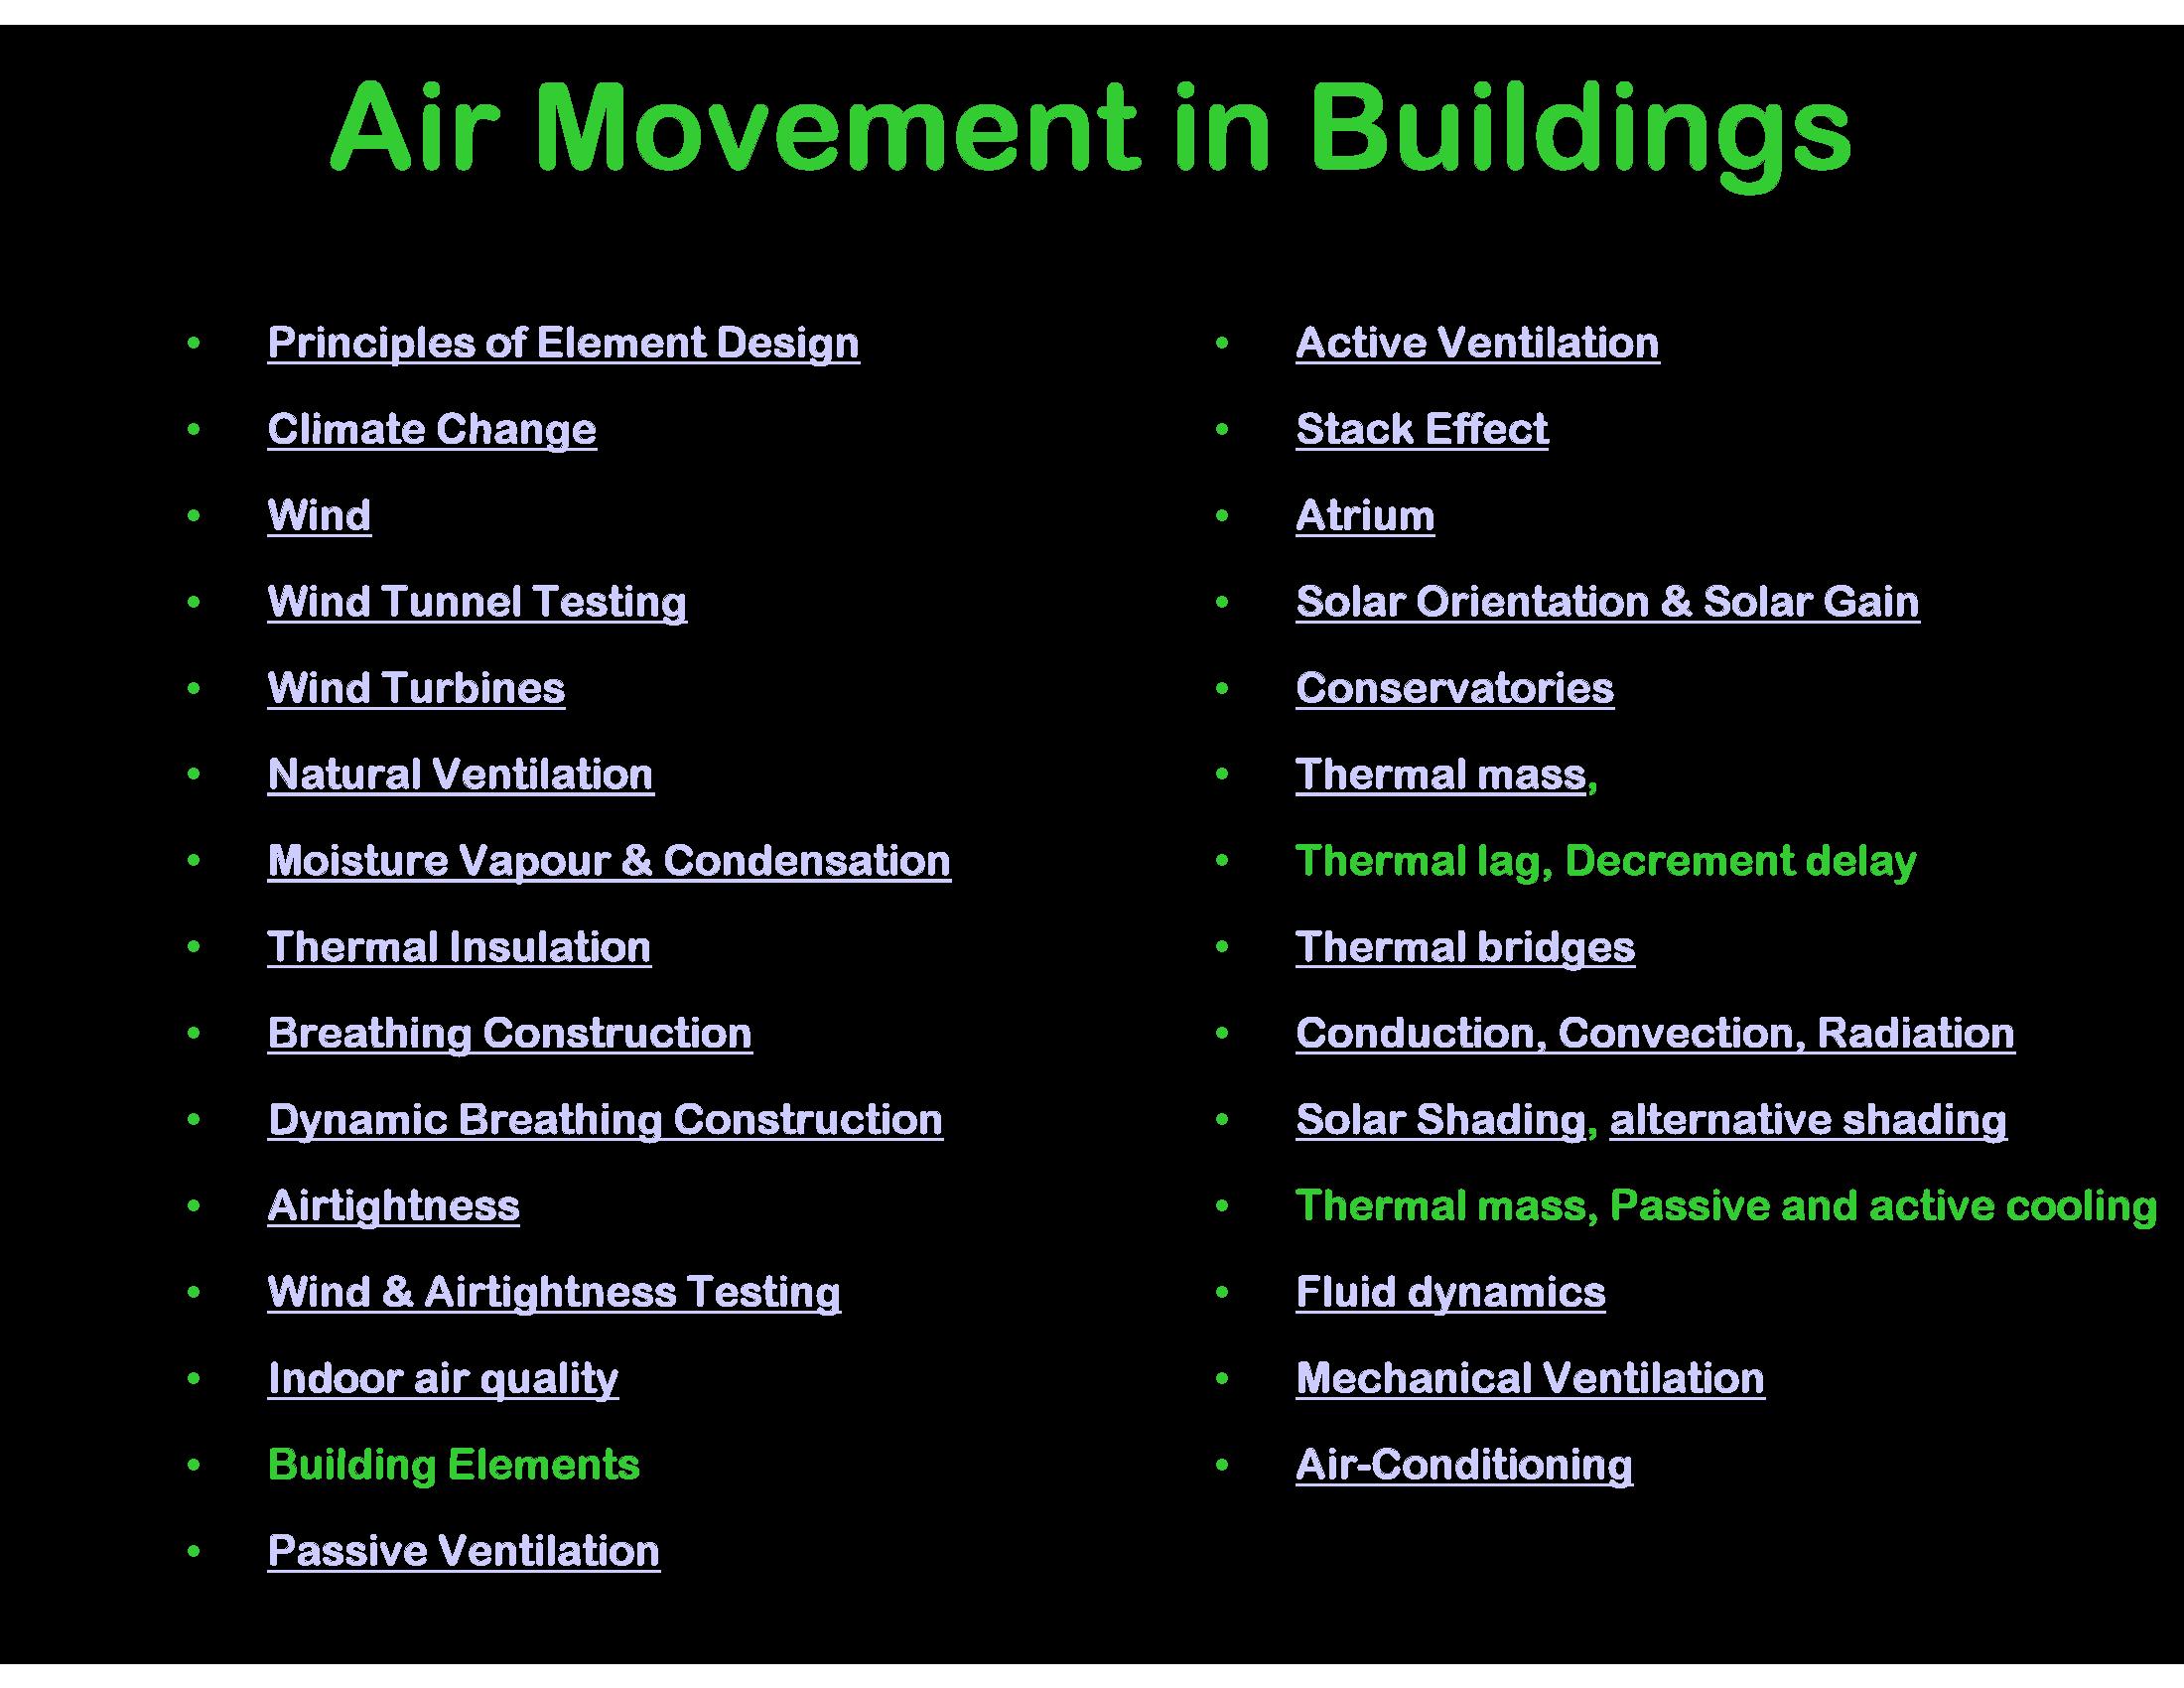 AirMovementInBuildings_Page_2